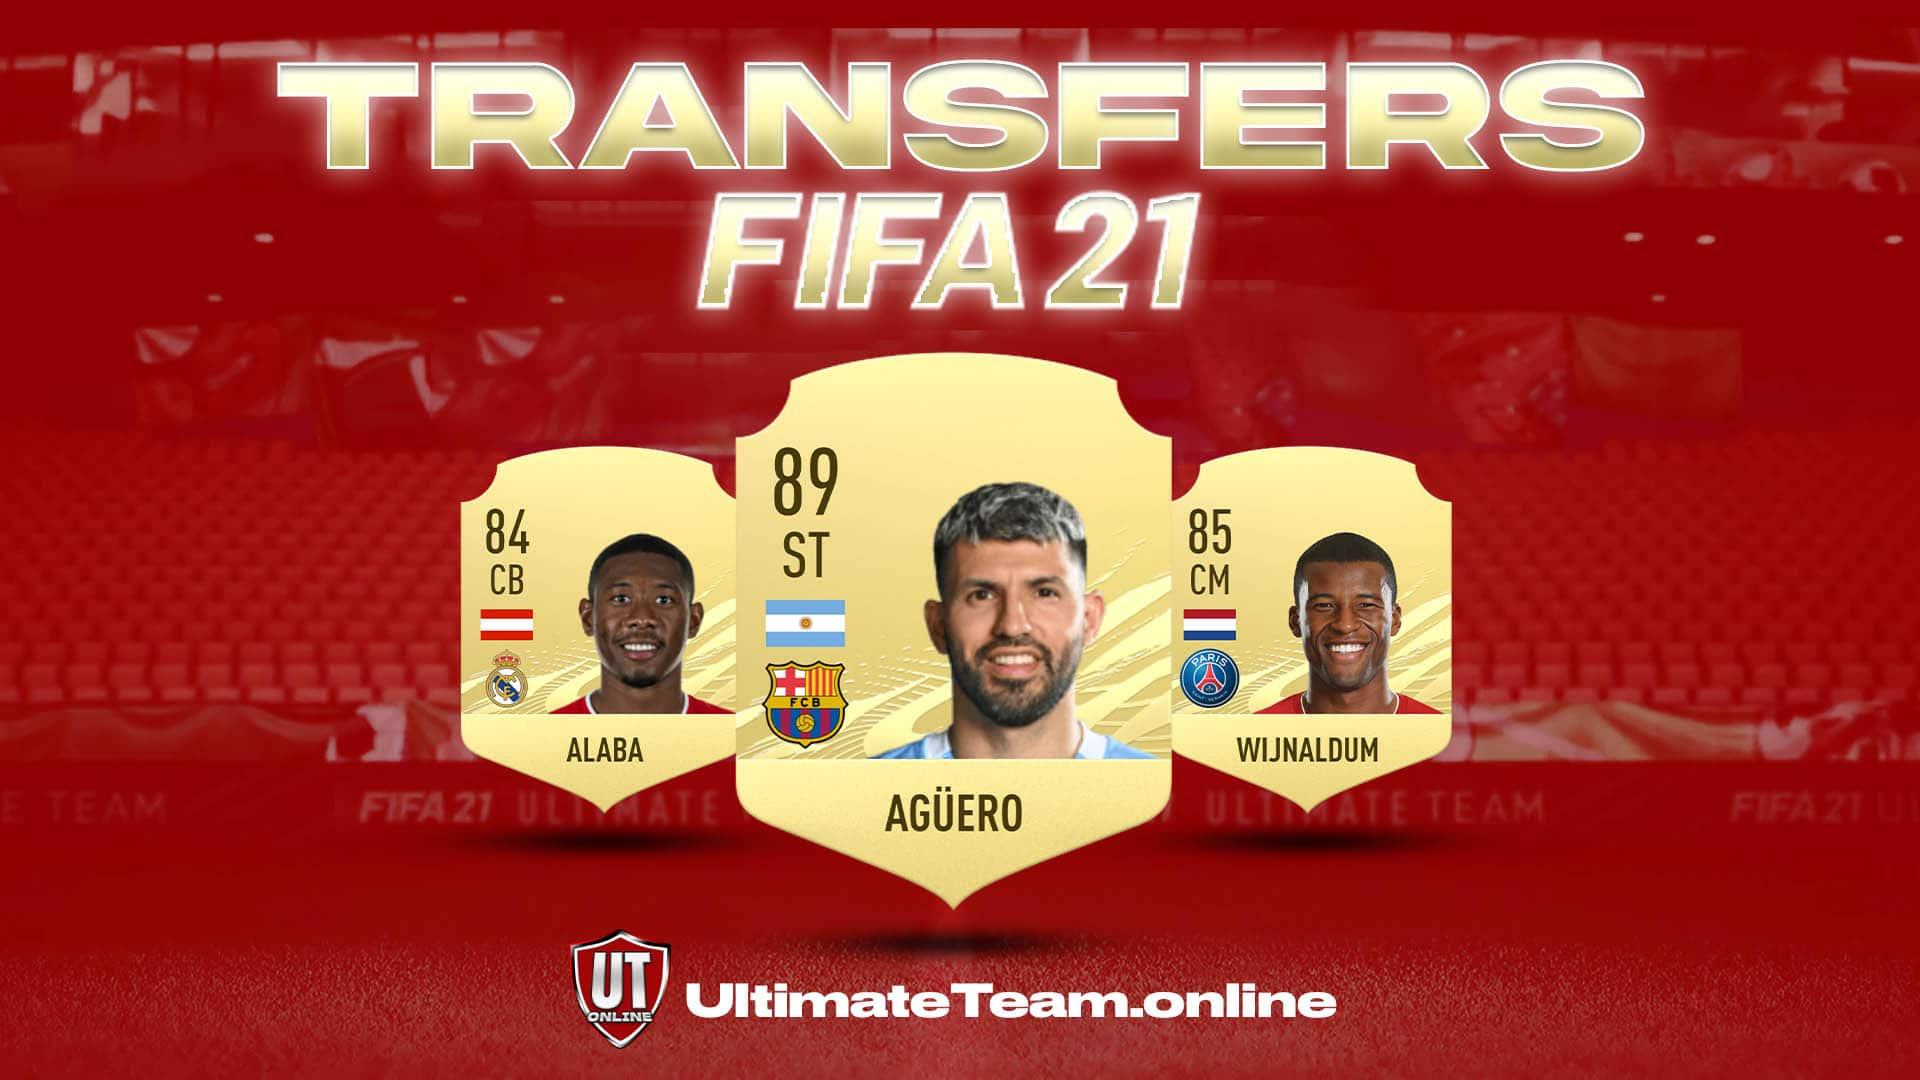 Transfers FIFA 21